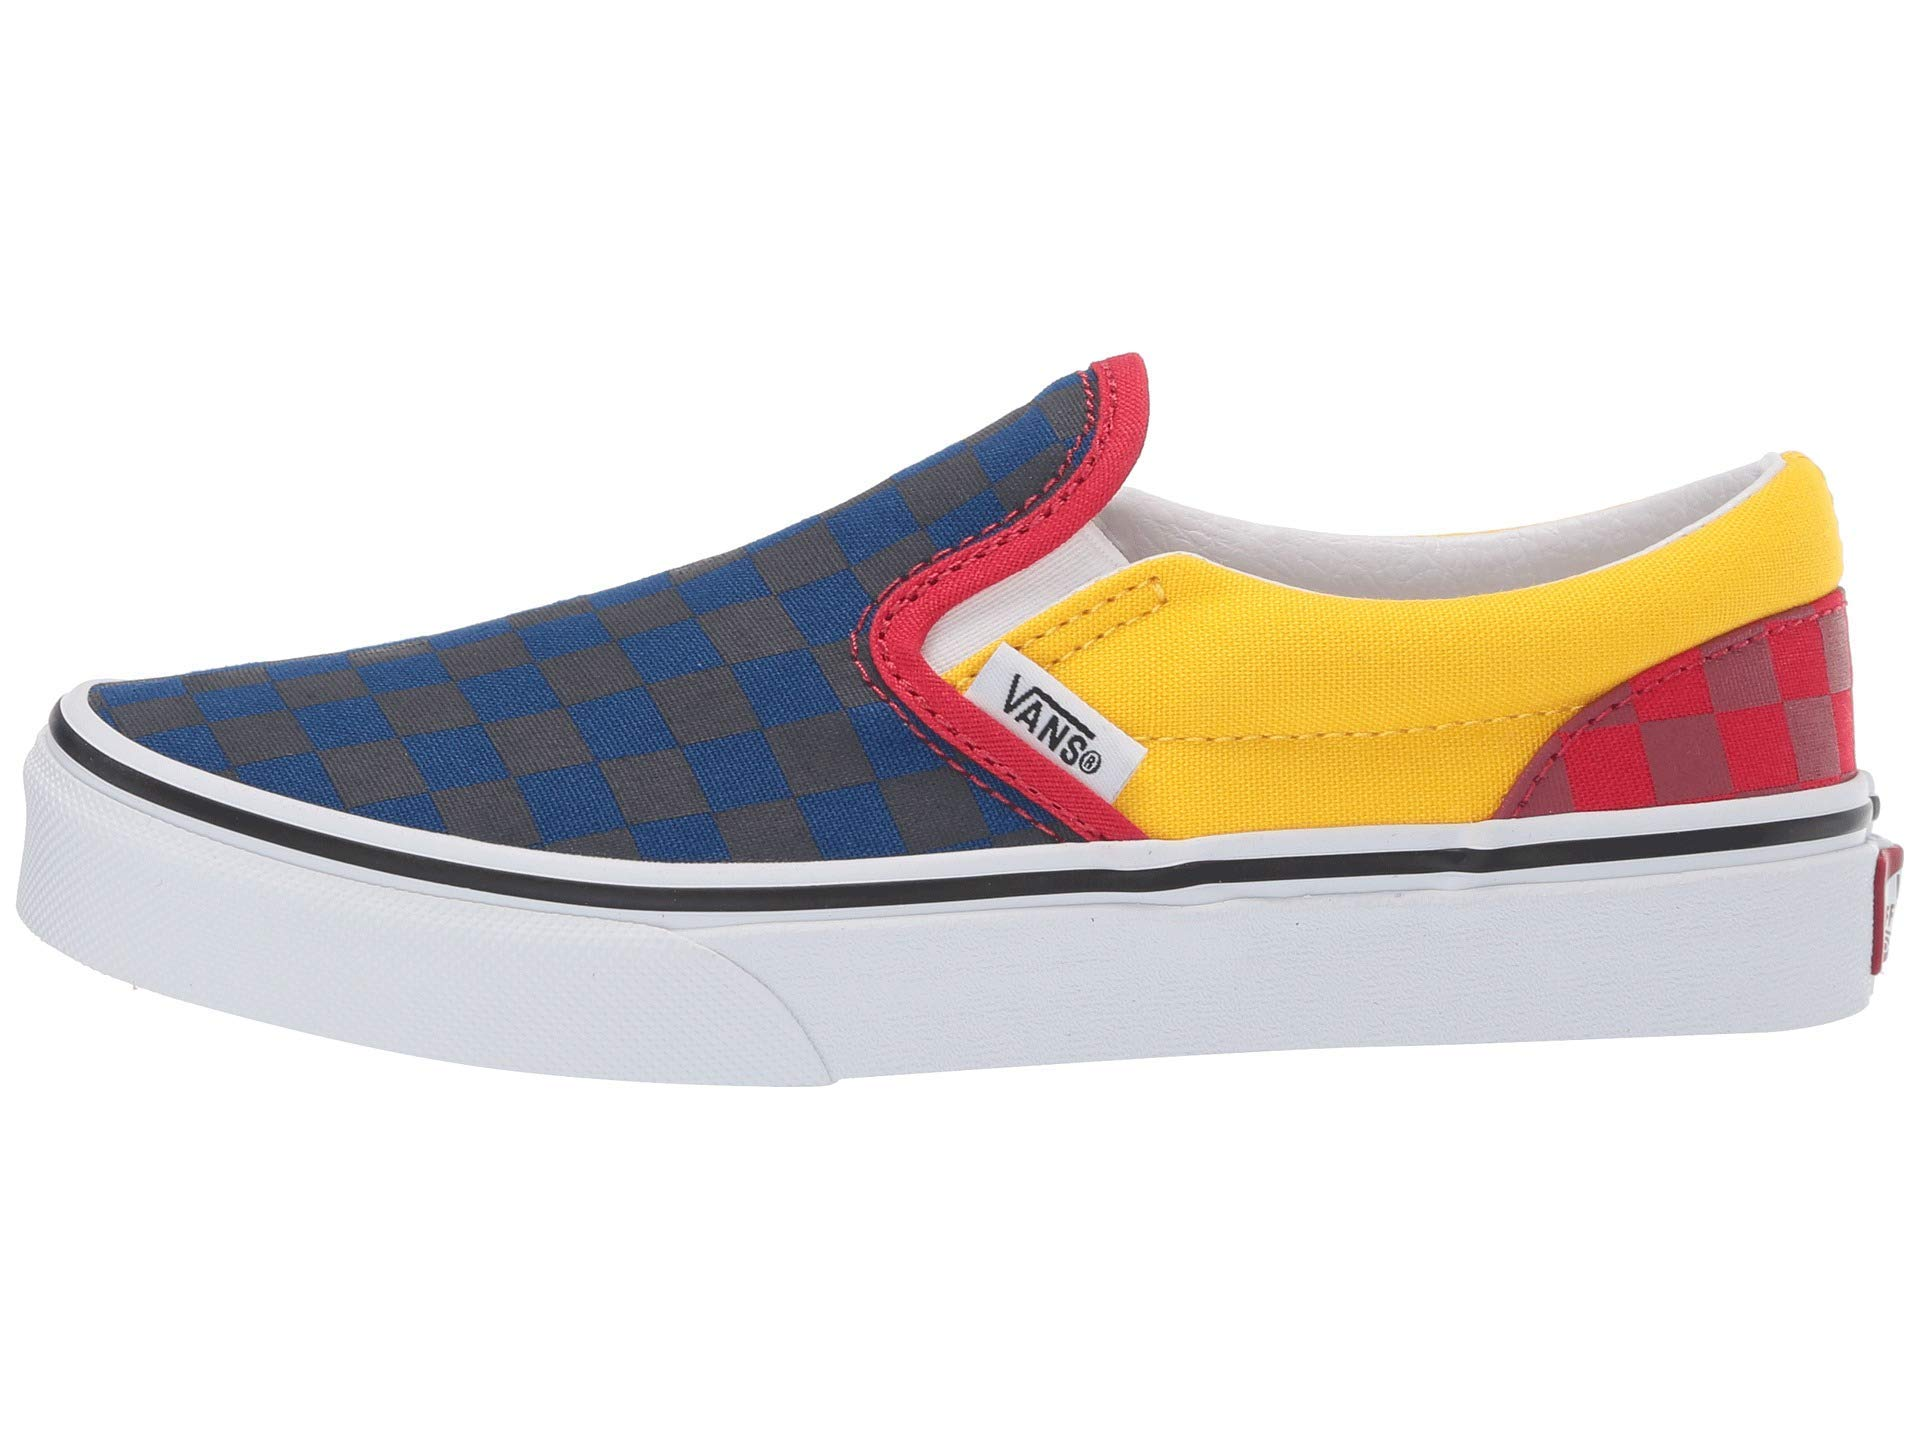 Vans Boy's Classic Slip On Skate Shoes (2.5 M US Little Kid, (OTW Rally) Navy/Yellow/Red)